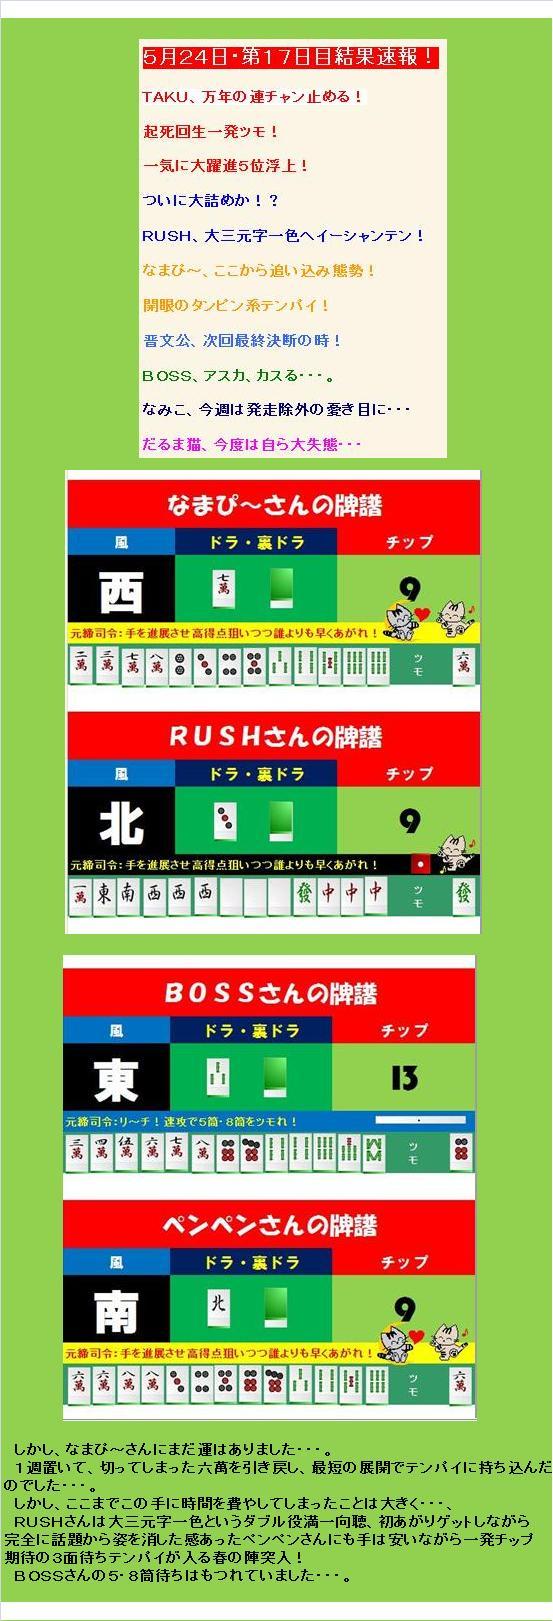 20100226・A組回顧09.jpg